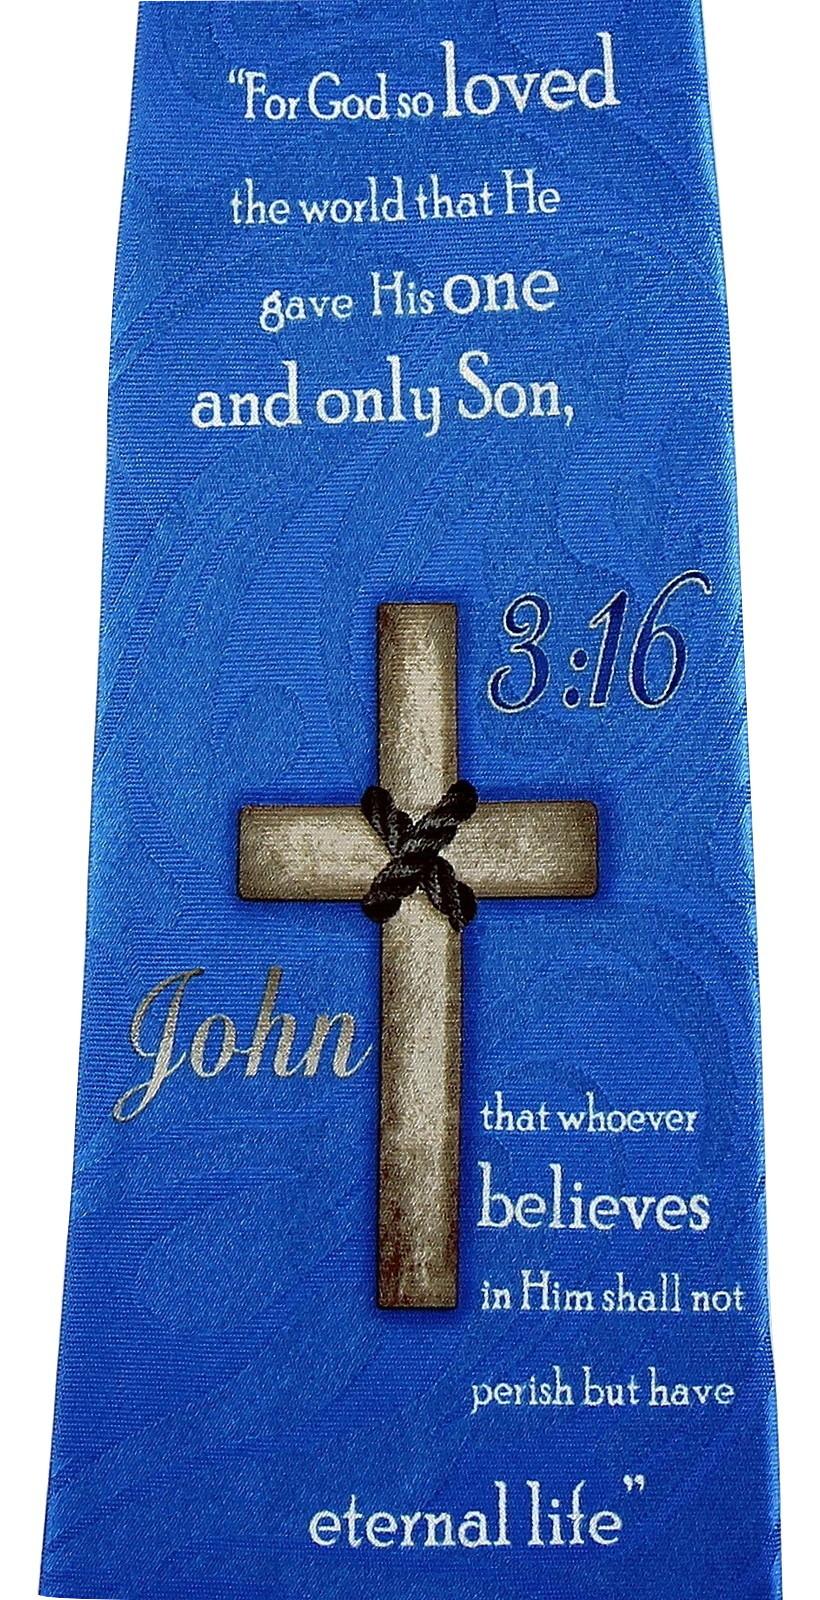 John 3:16 Mens Neck Tie Religious Scripture Christian Jesus Christ Blue Necktie image 2